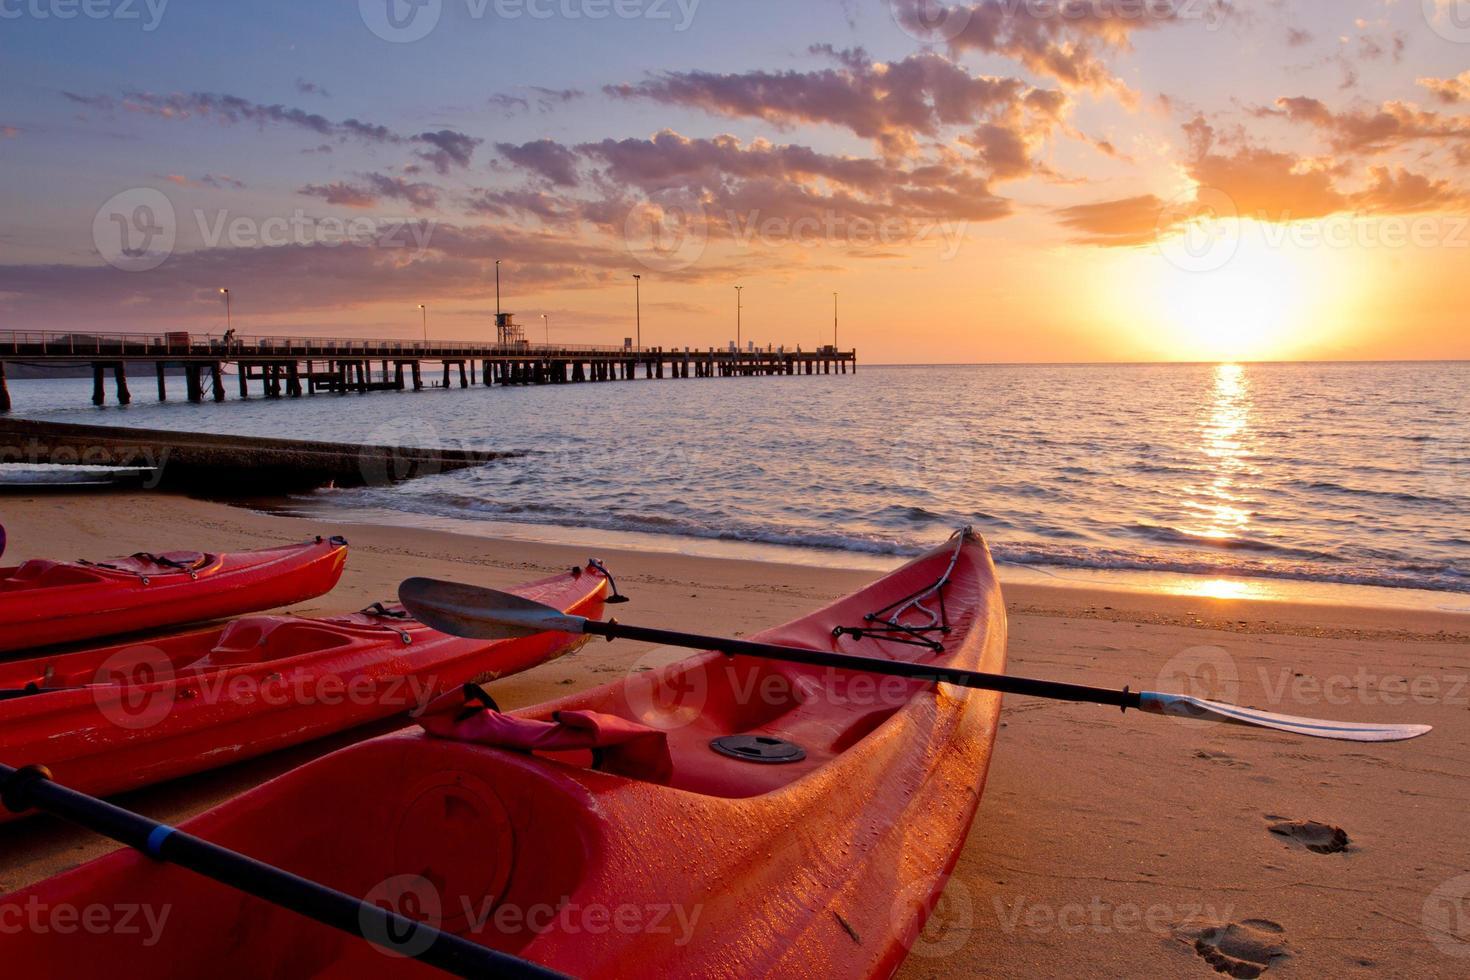 drie rode kajaks op het strand bij zonsopgang foto